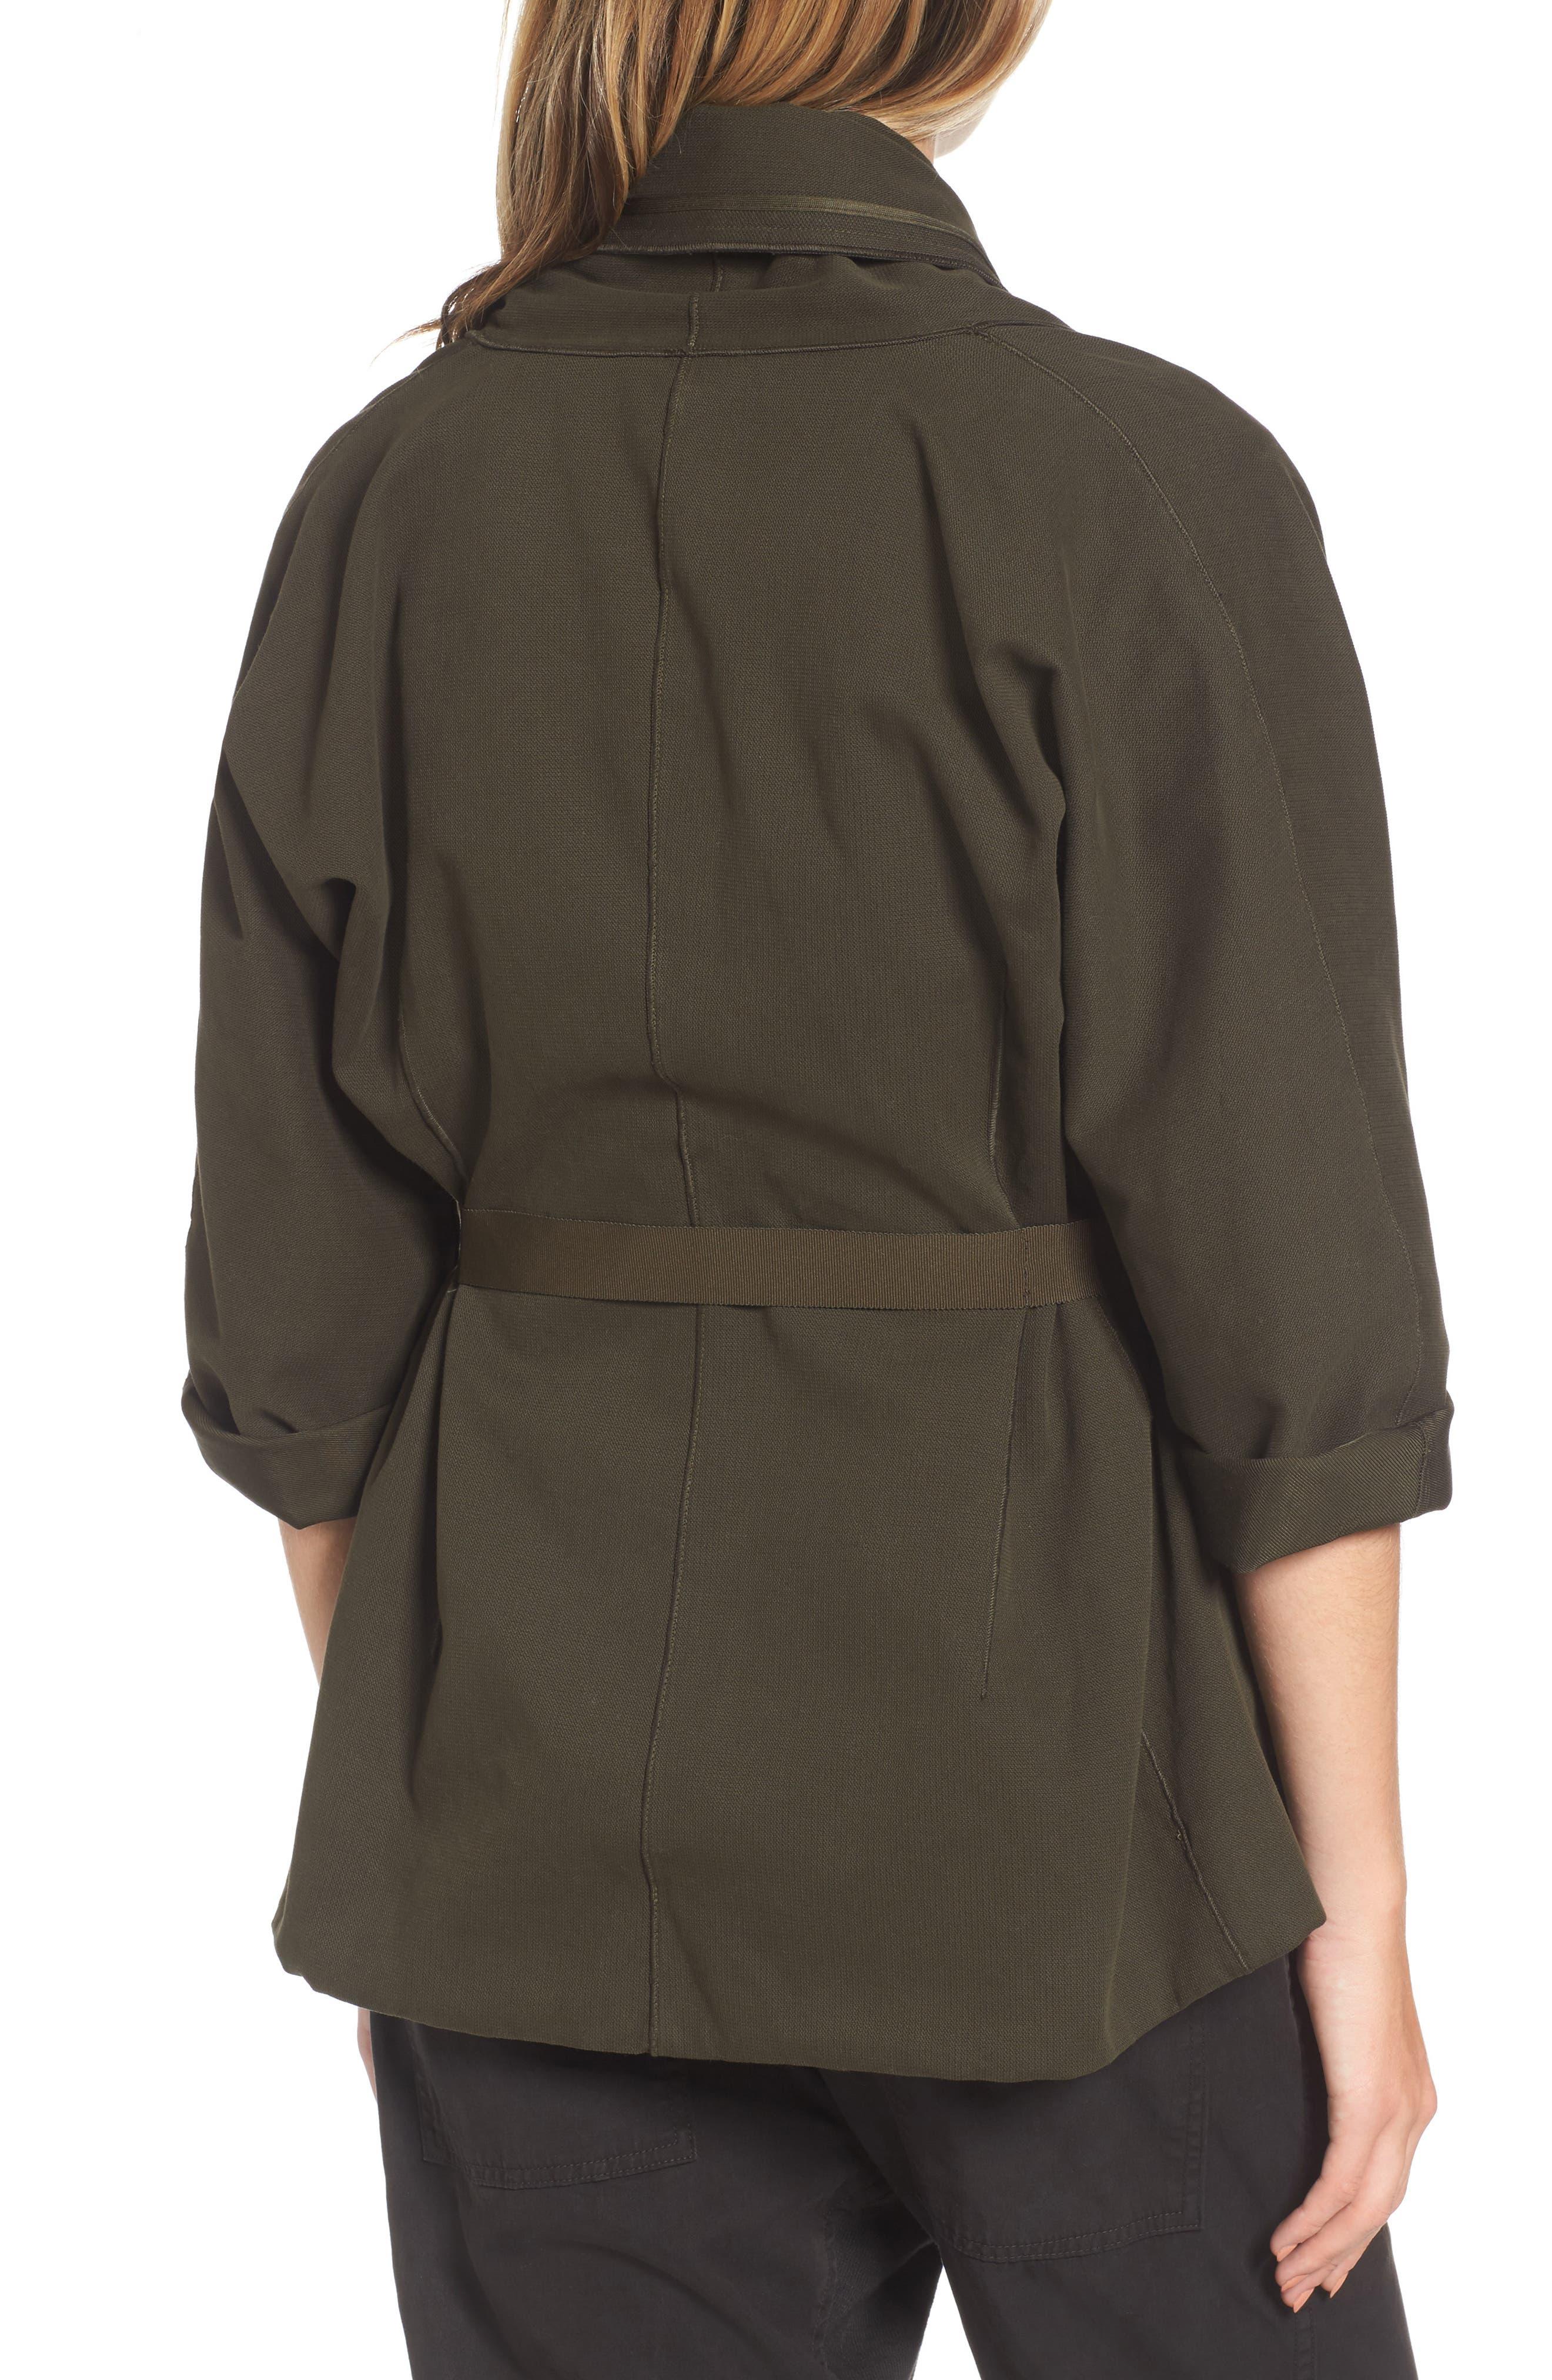 Blanket Kimono Jacket,                             Alternate thumbnail 2, color,